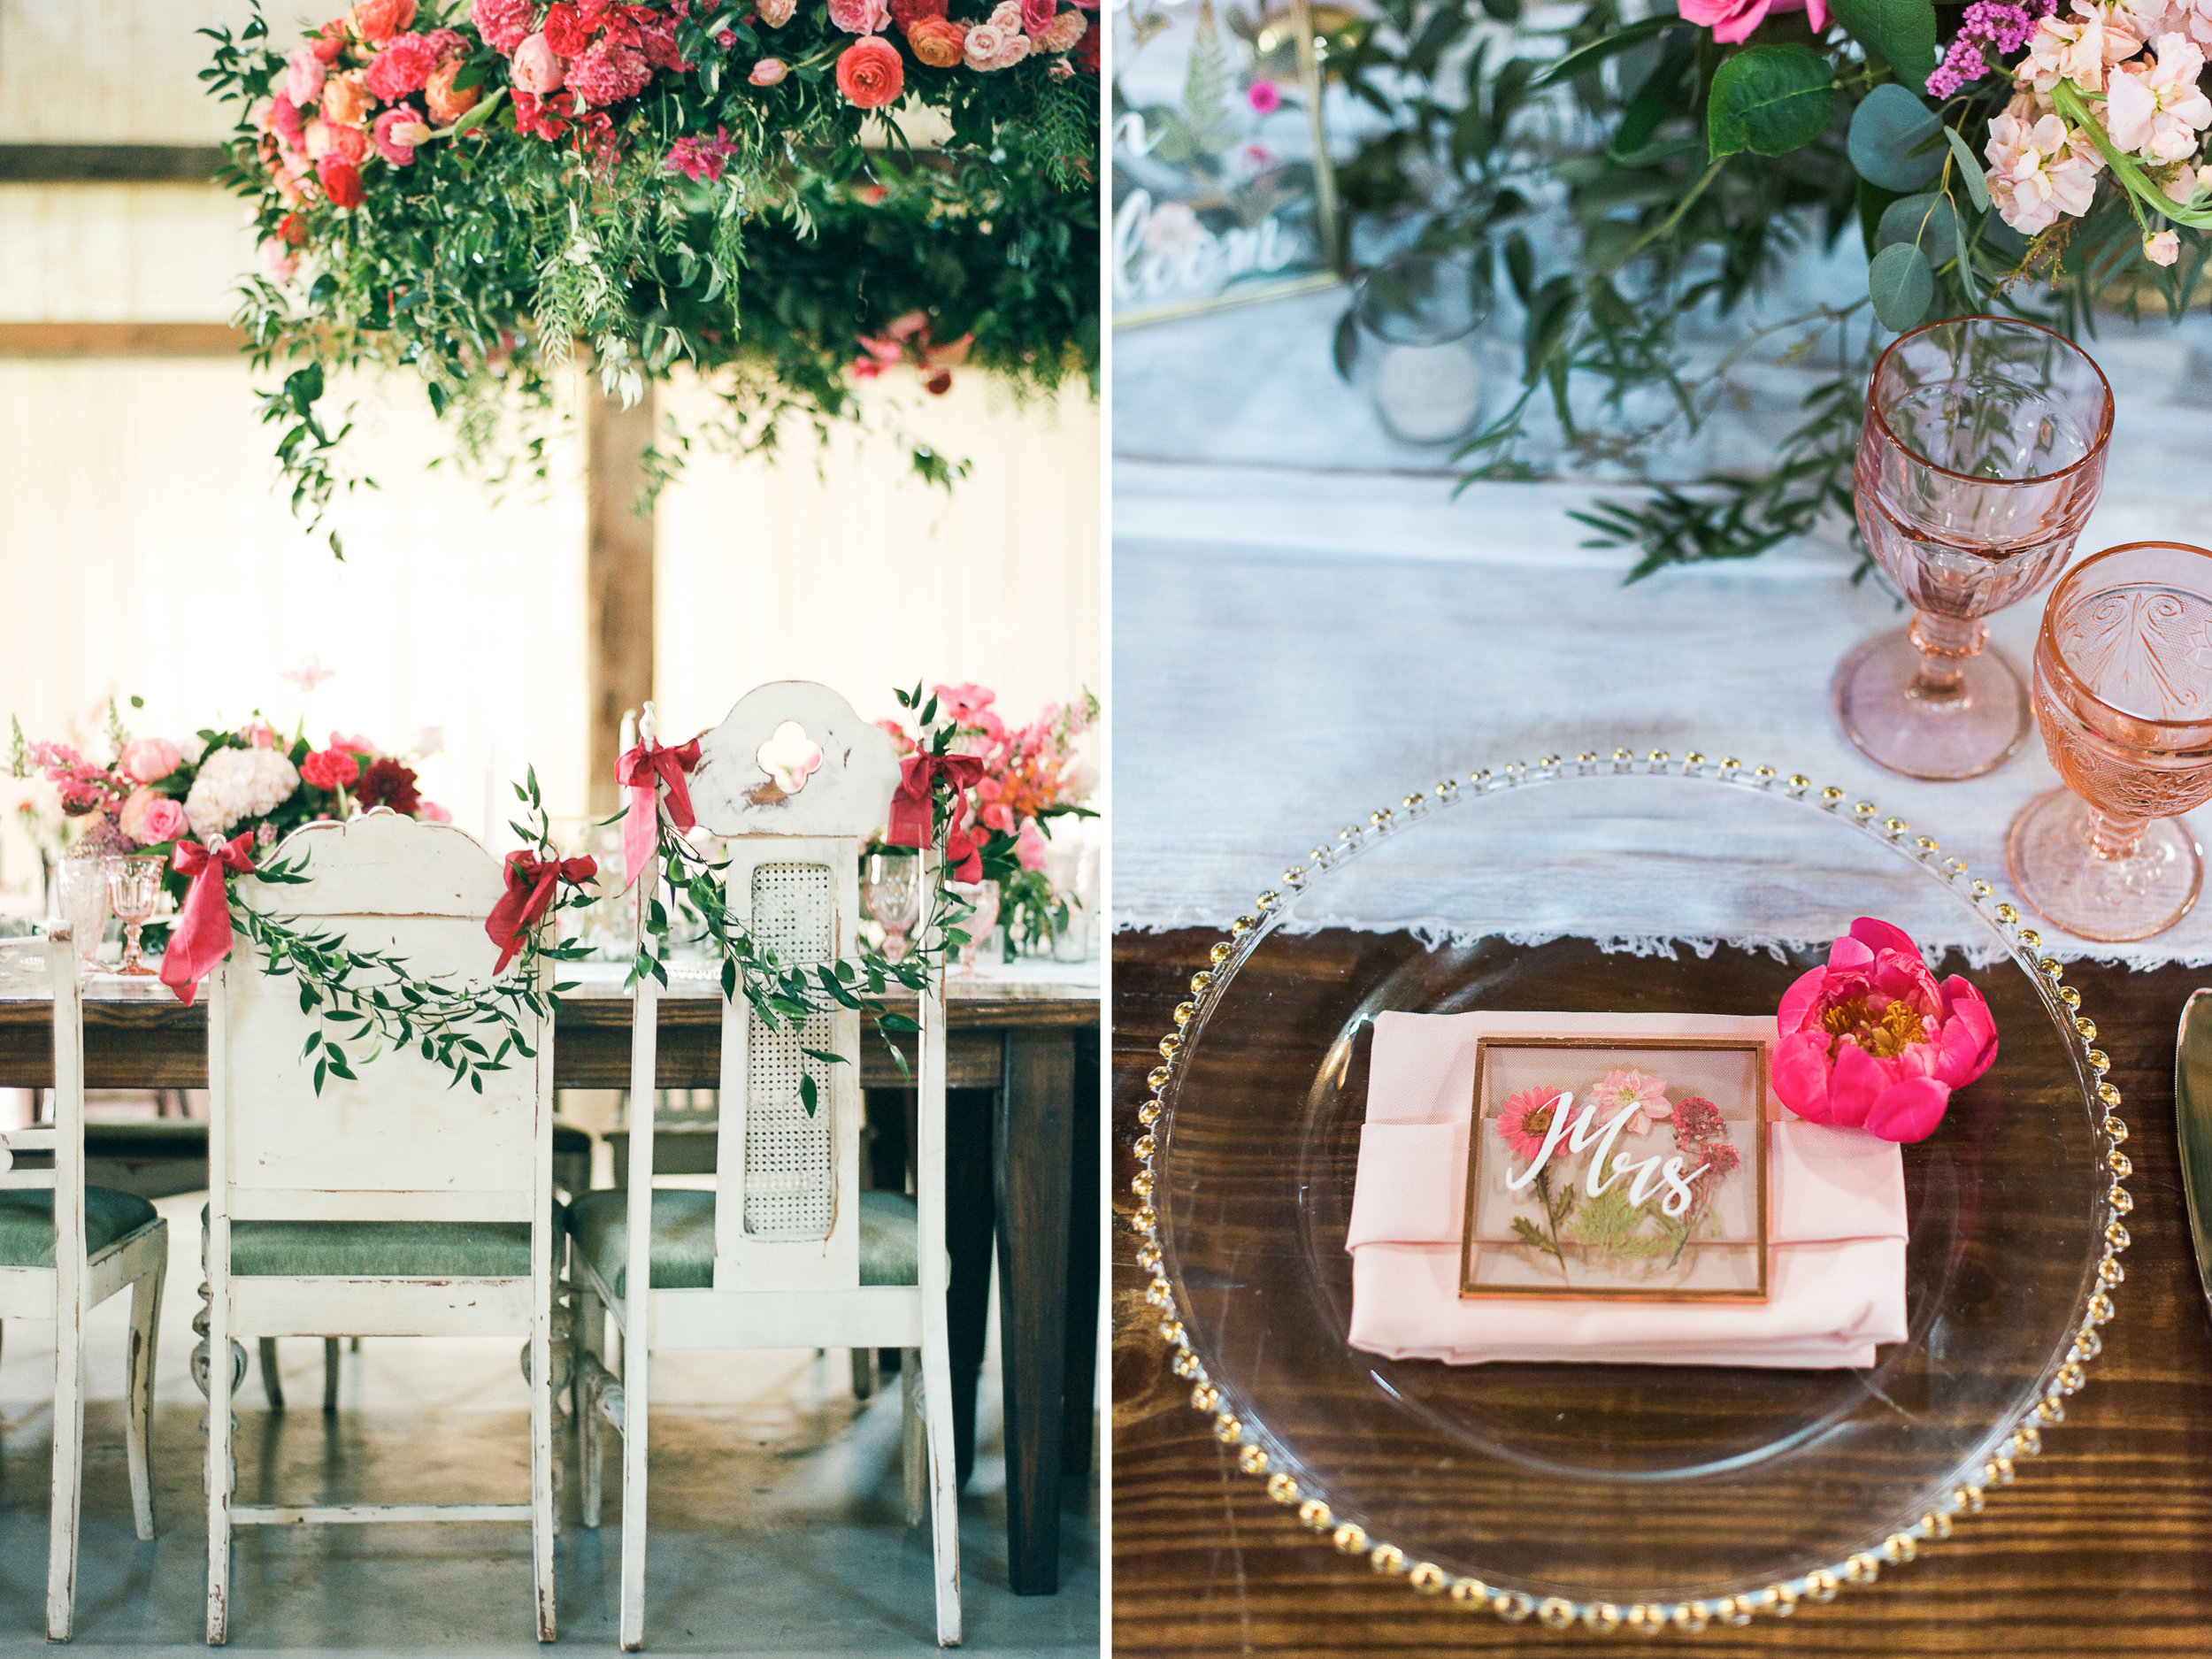 The-Knot-50-Weddings-50-States-Texas-Winner-Dana-Fernandez-photography-houston-wedding-photographer-film-fine-art-destination-171.jpg